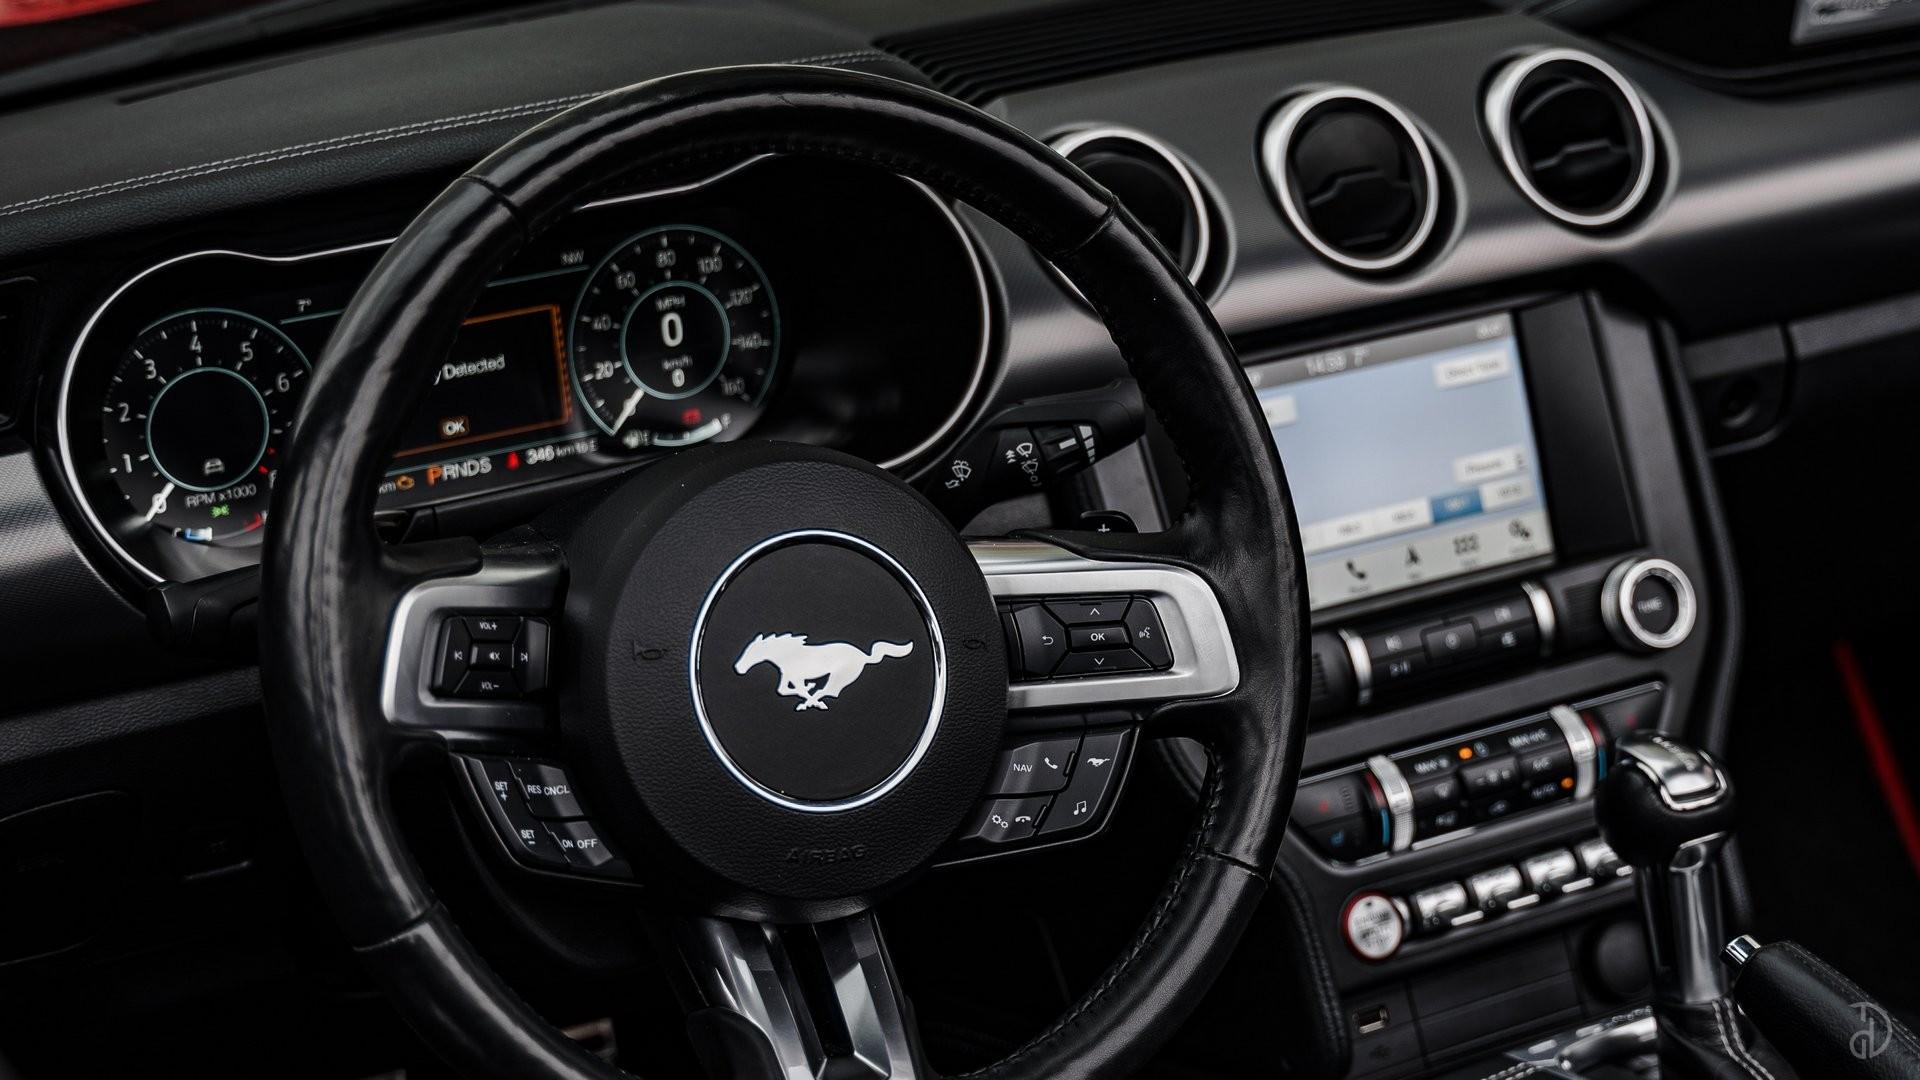 Аренда Ford Mustang GT 5.0 в Сочи. Фото 9